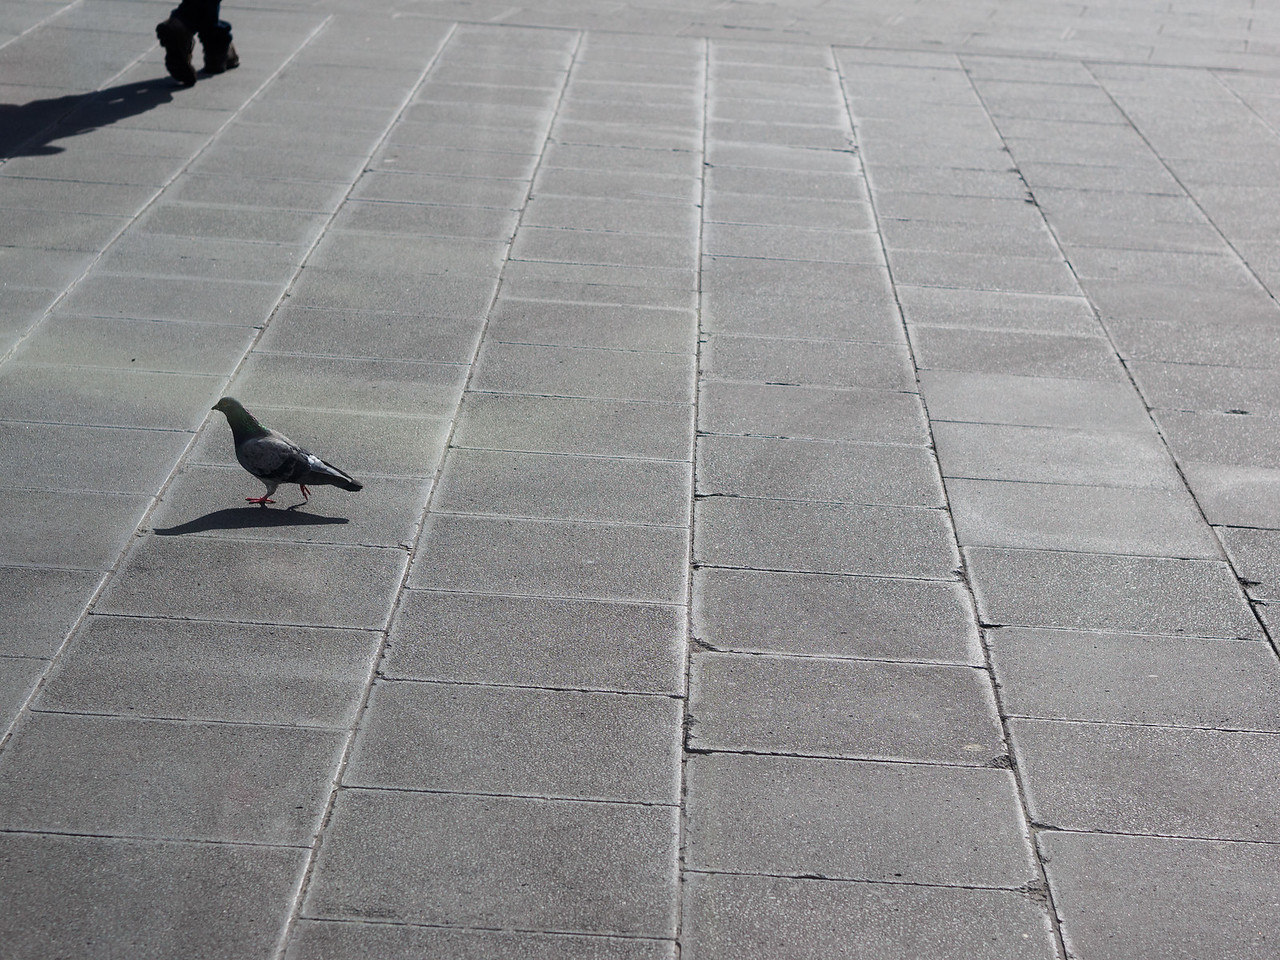 Bird + Feet